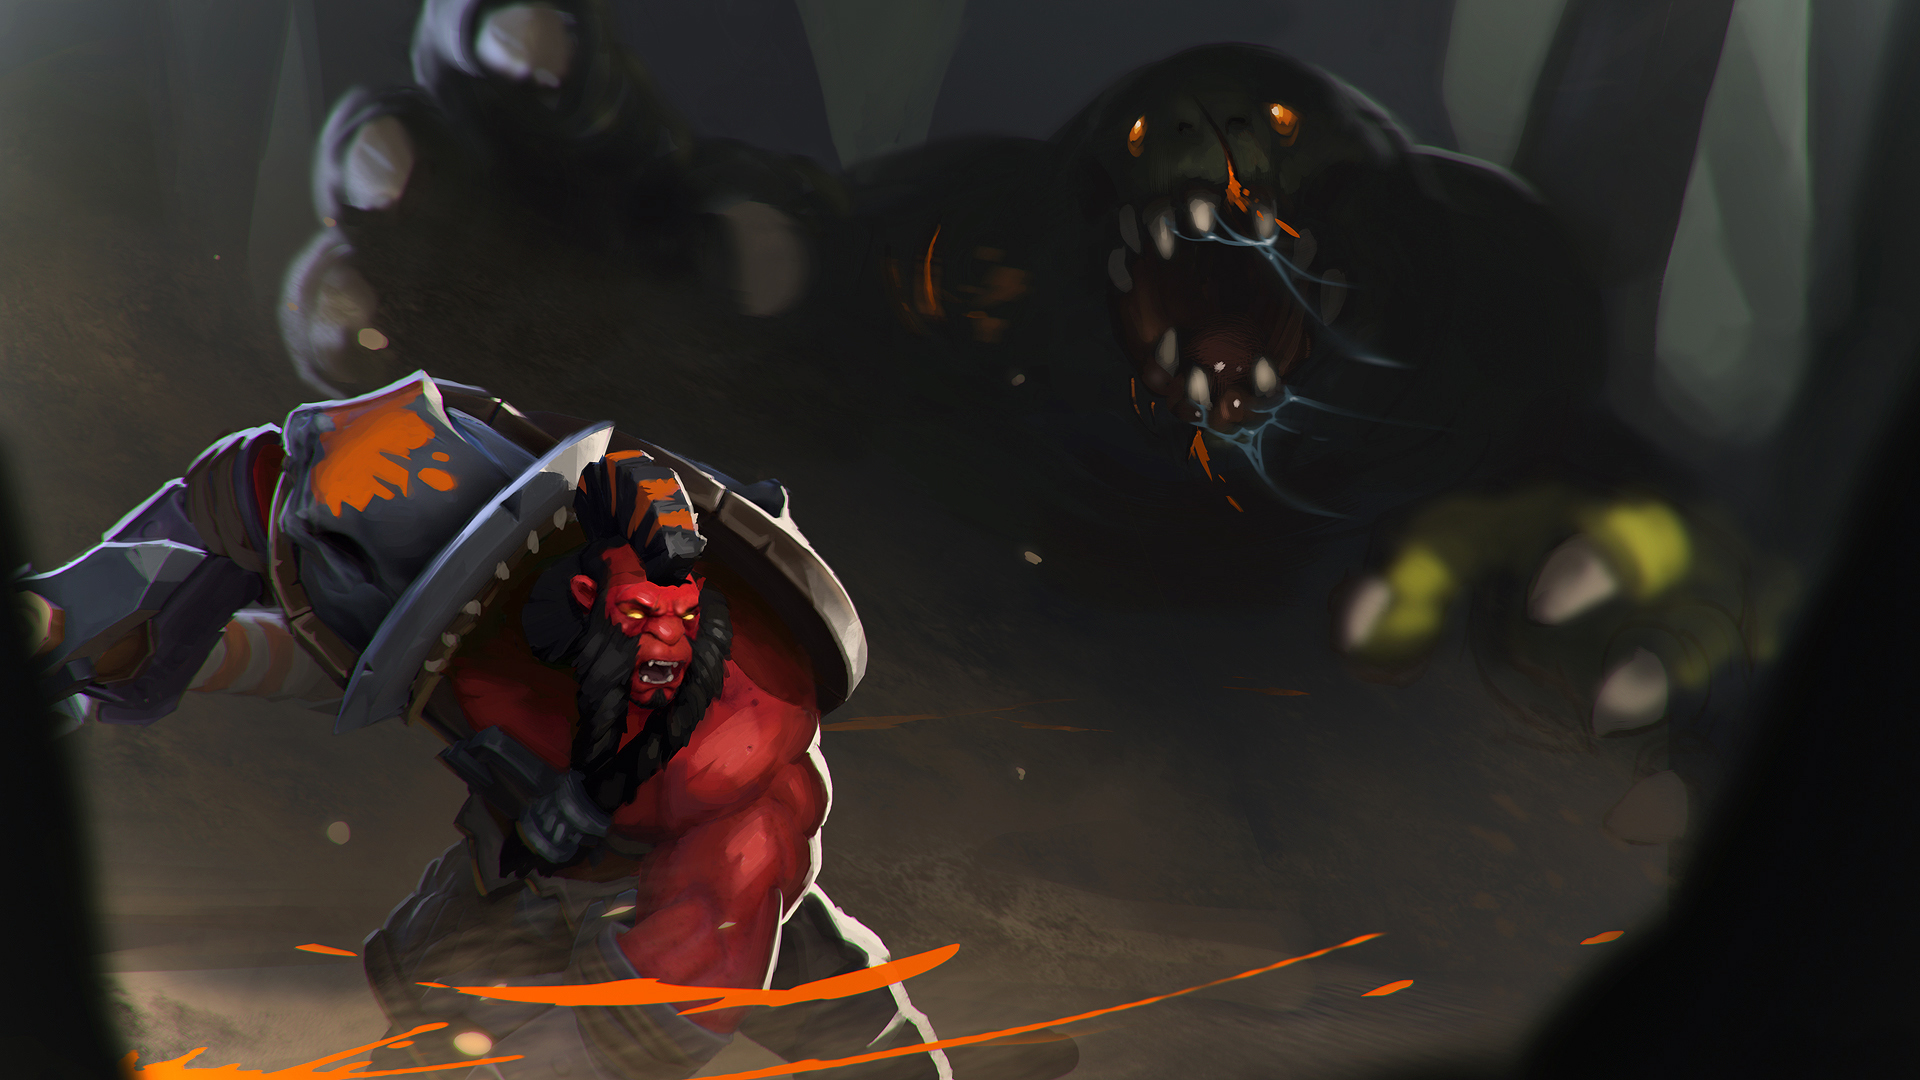 Axe Dota 2 Fight Wallpaper HD